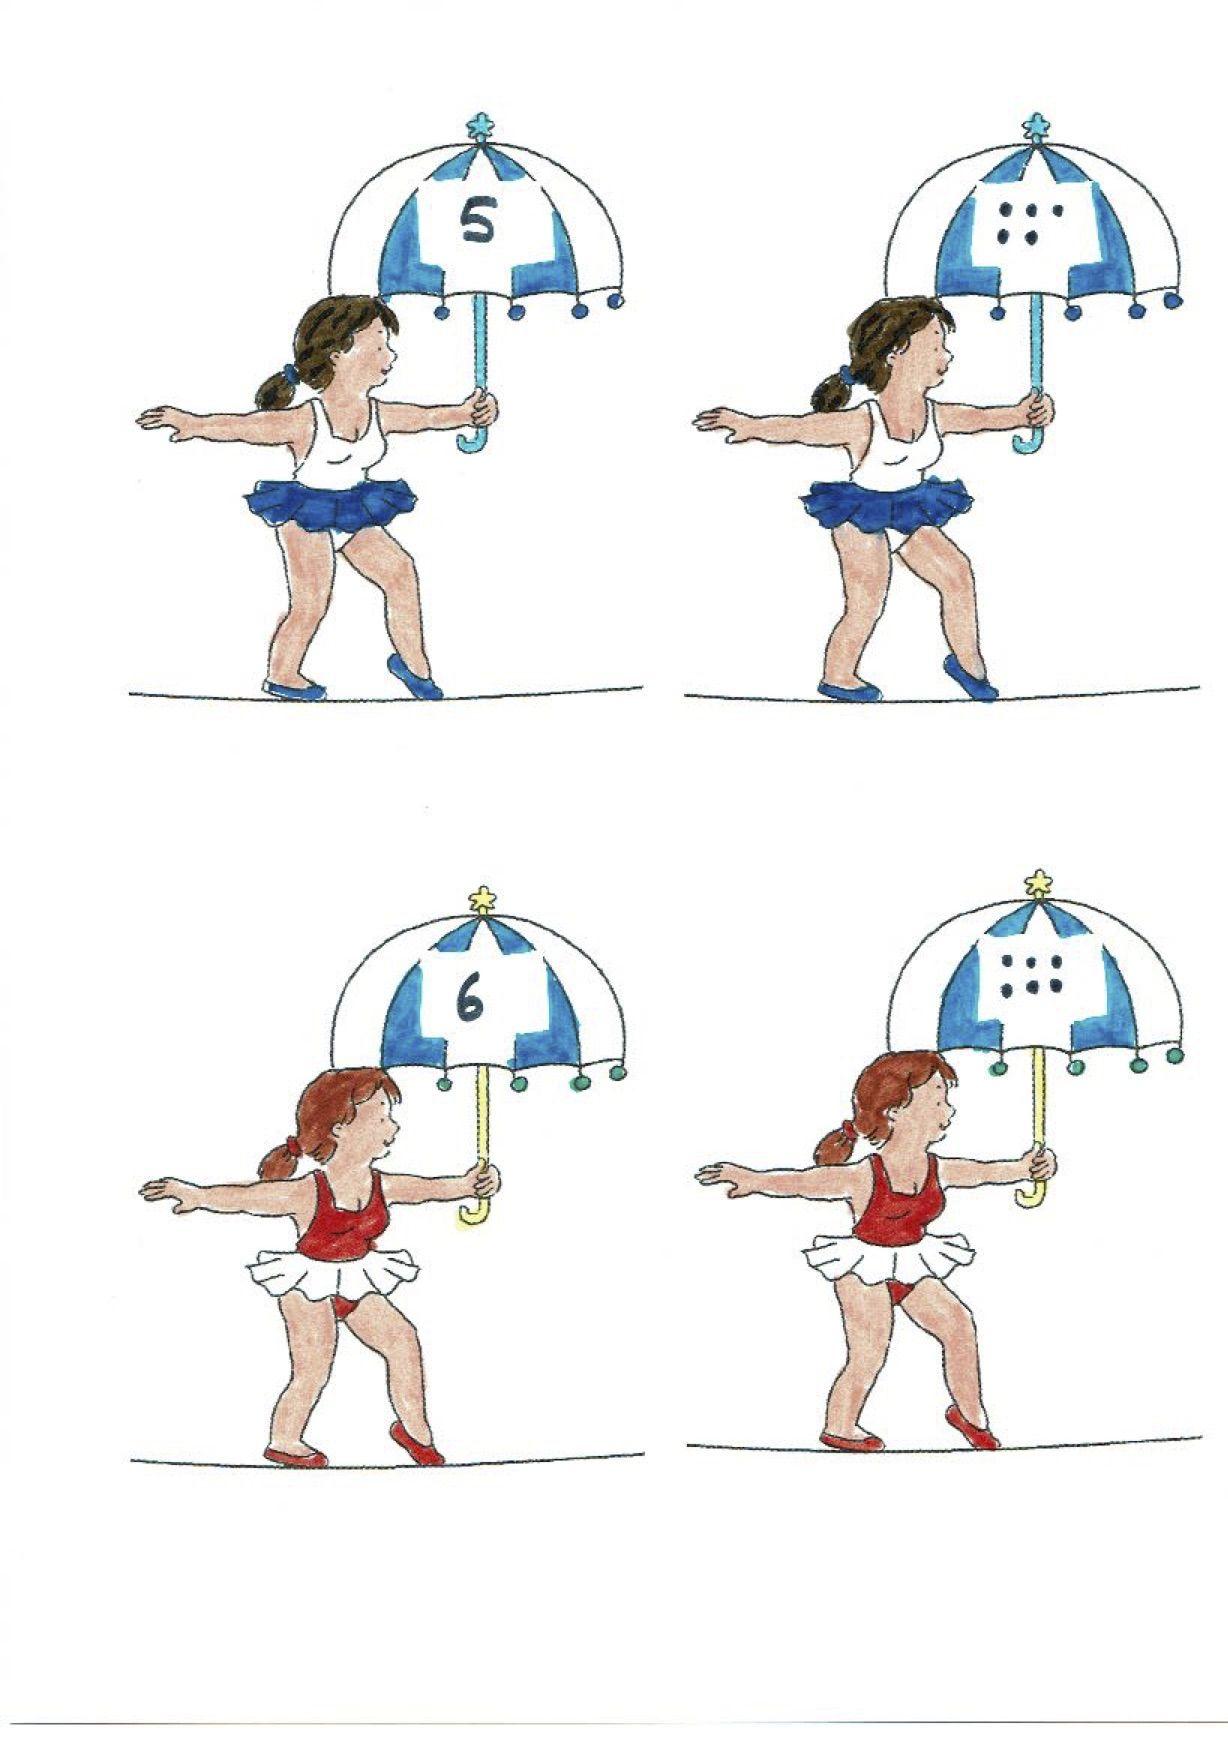 Circus Koorddanser Getalbeeld En Cijfer